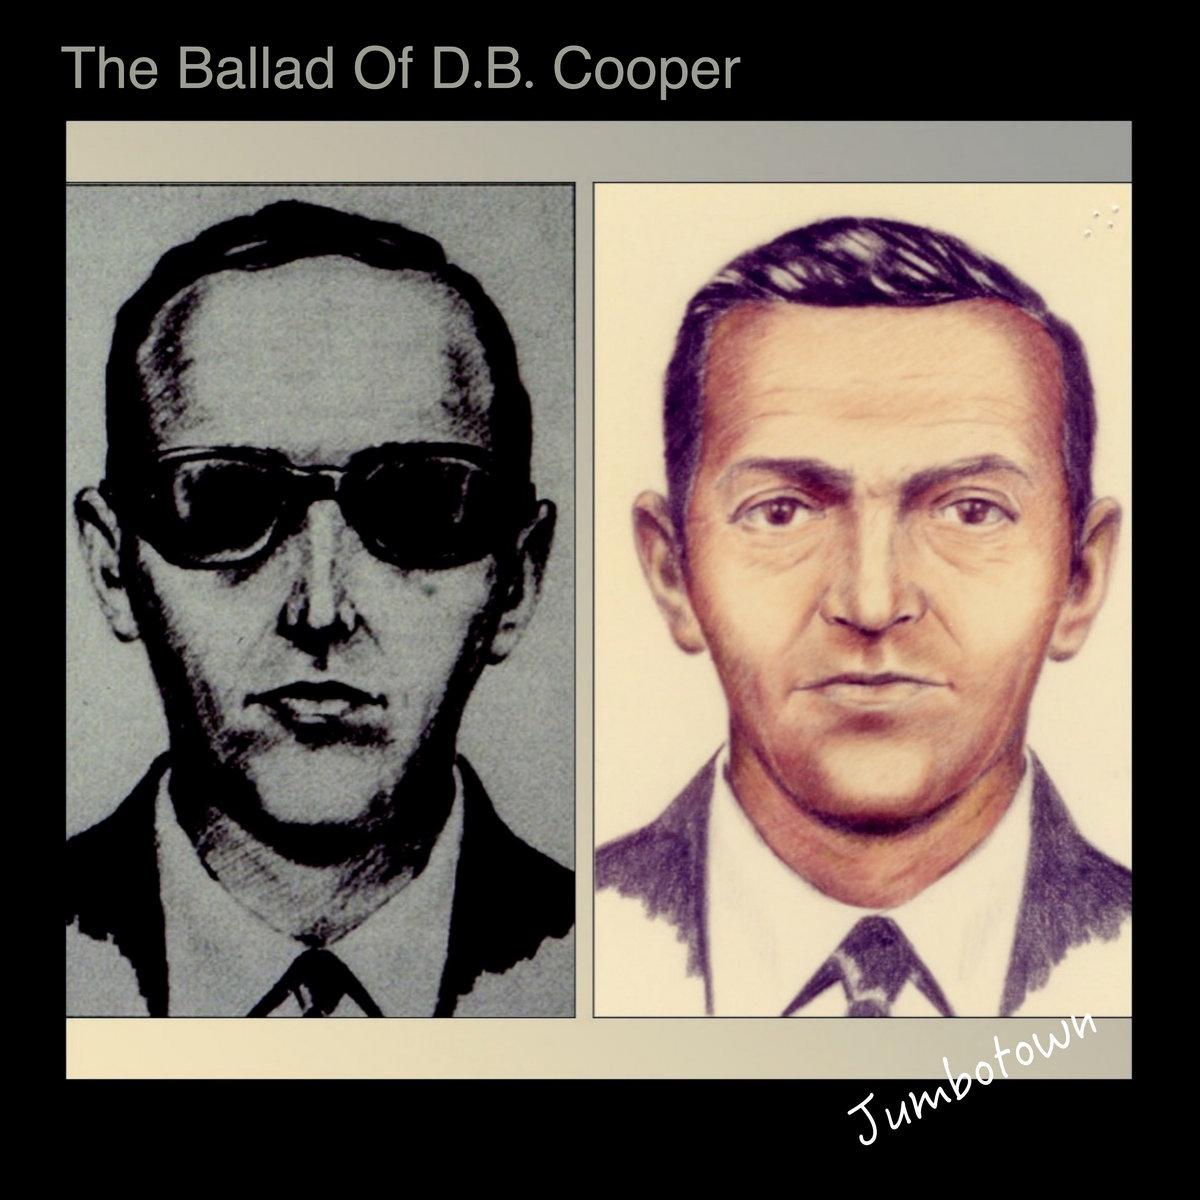 The Ballad Of D.B. Cooper by Jumbotown